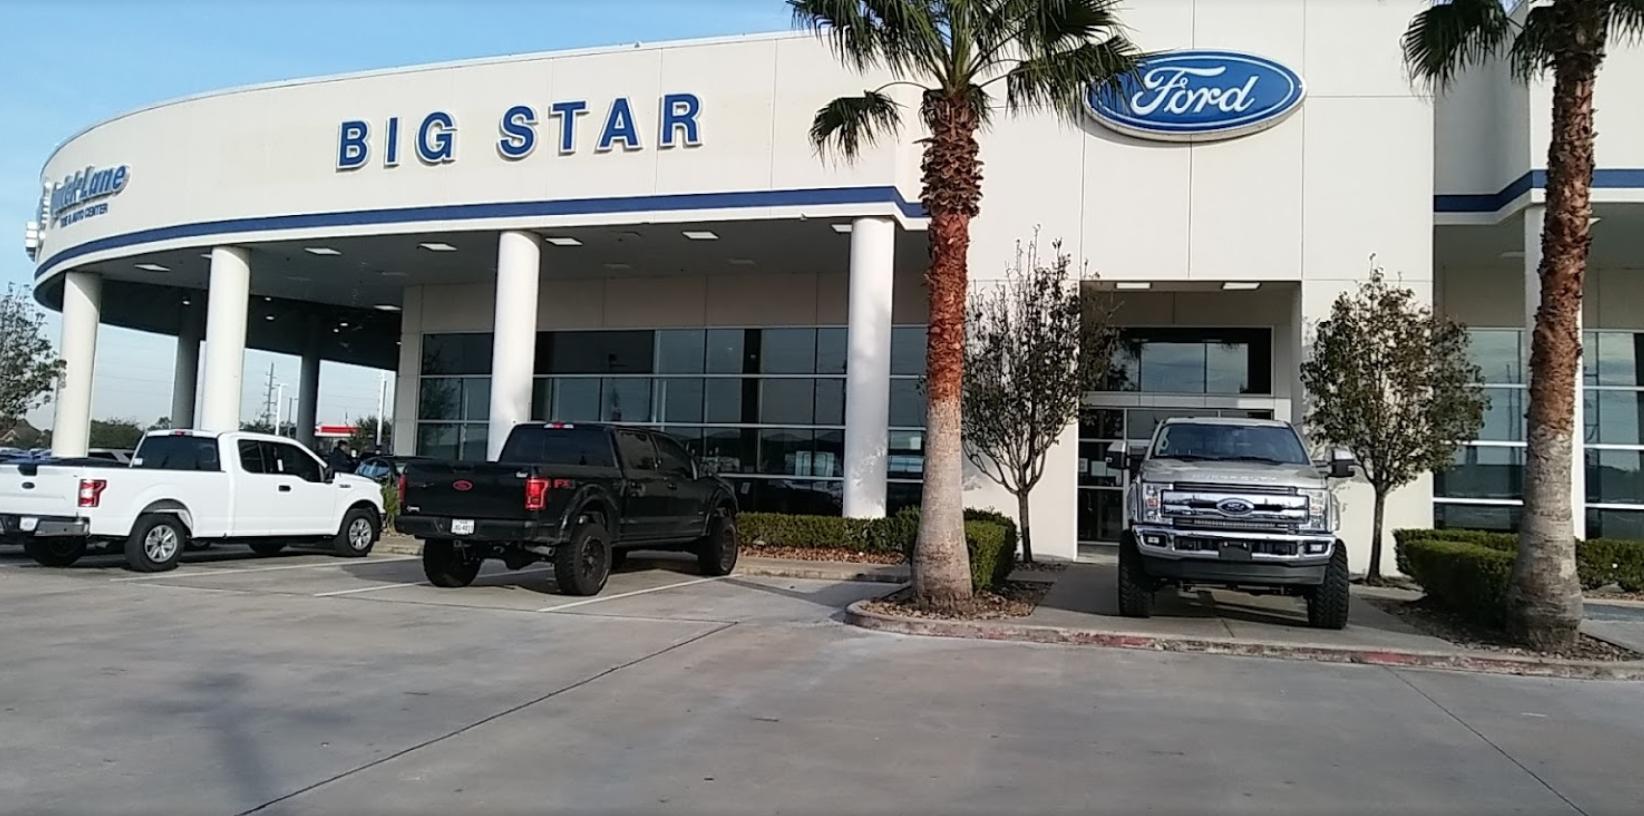 Big Star Ford image 0